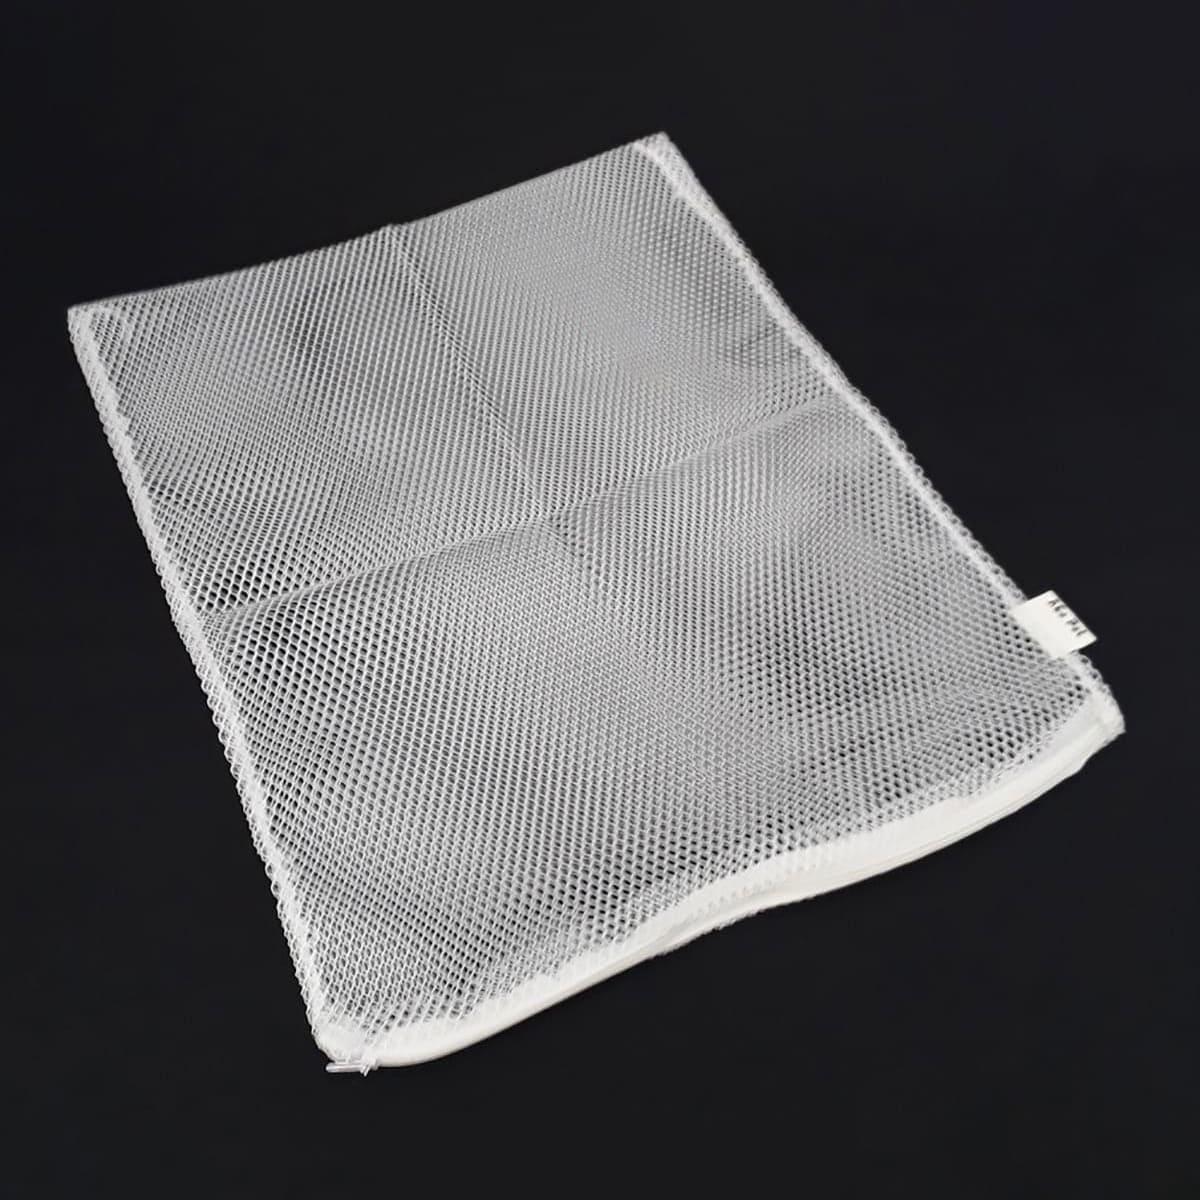 Bolsa para Material Filtrante N°5 WFish - 15X38 cm